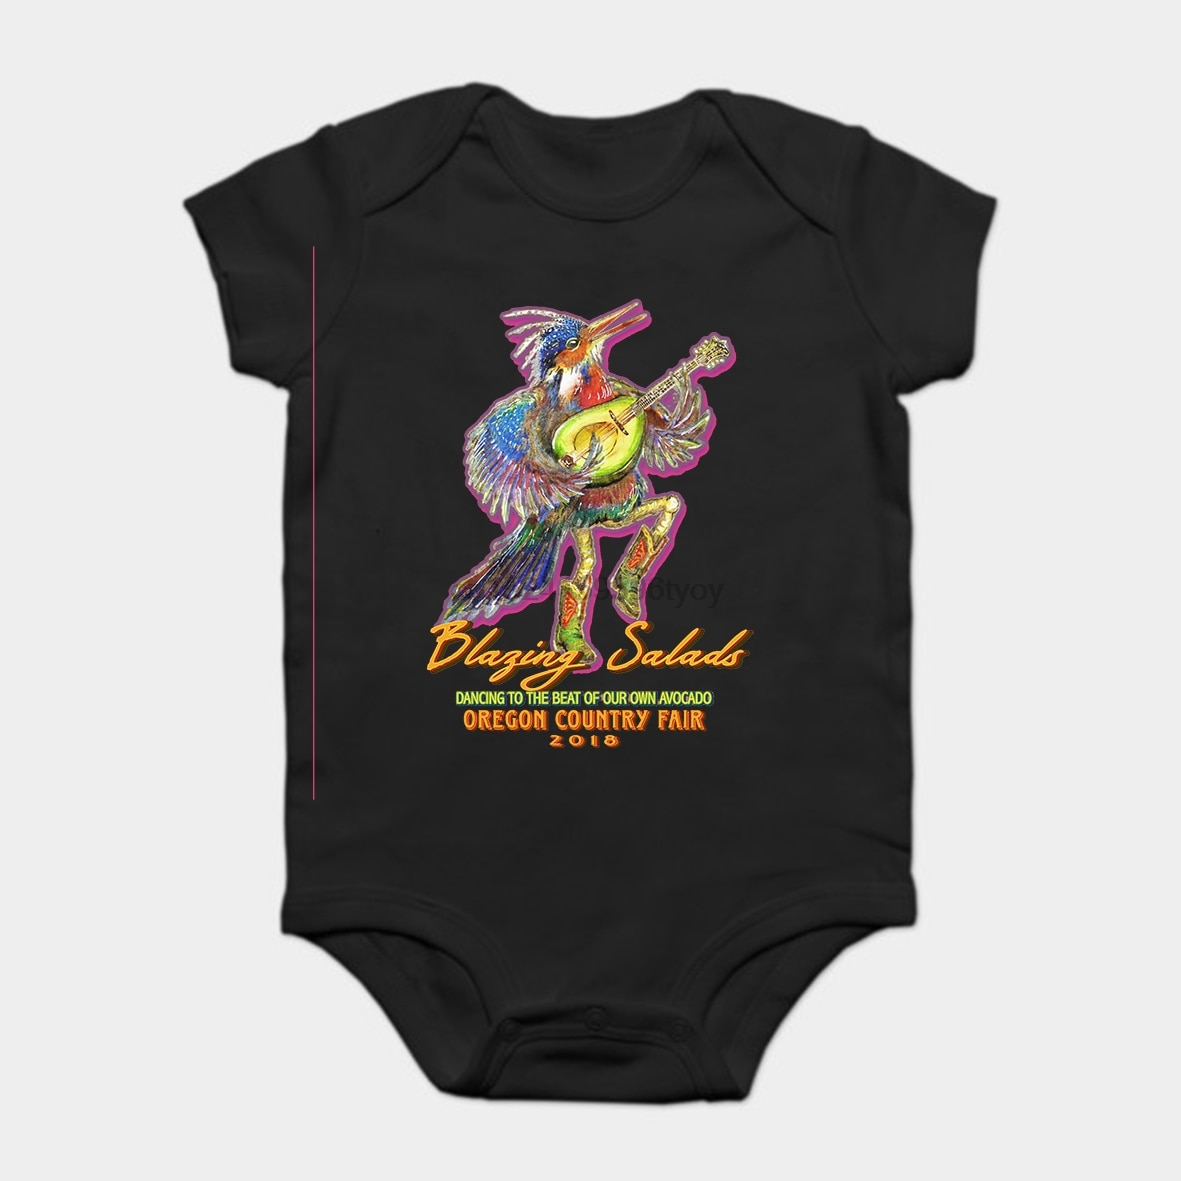 Baby Onesie Baby Bodysuits kid t shirt Printed Cotton Short-Sleeve Ocultar los memes monkaS